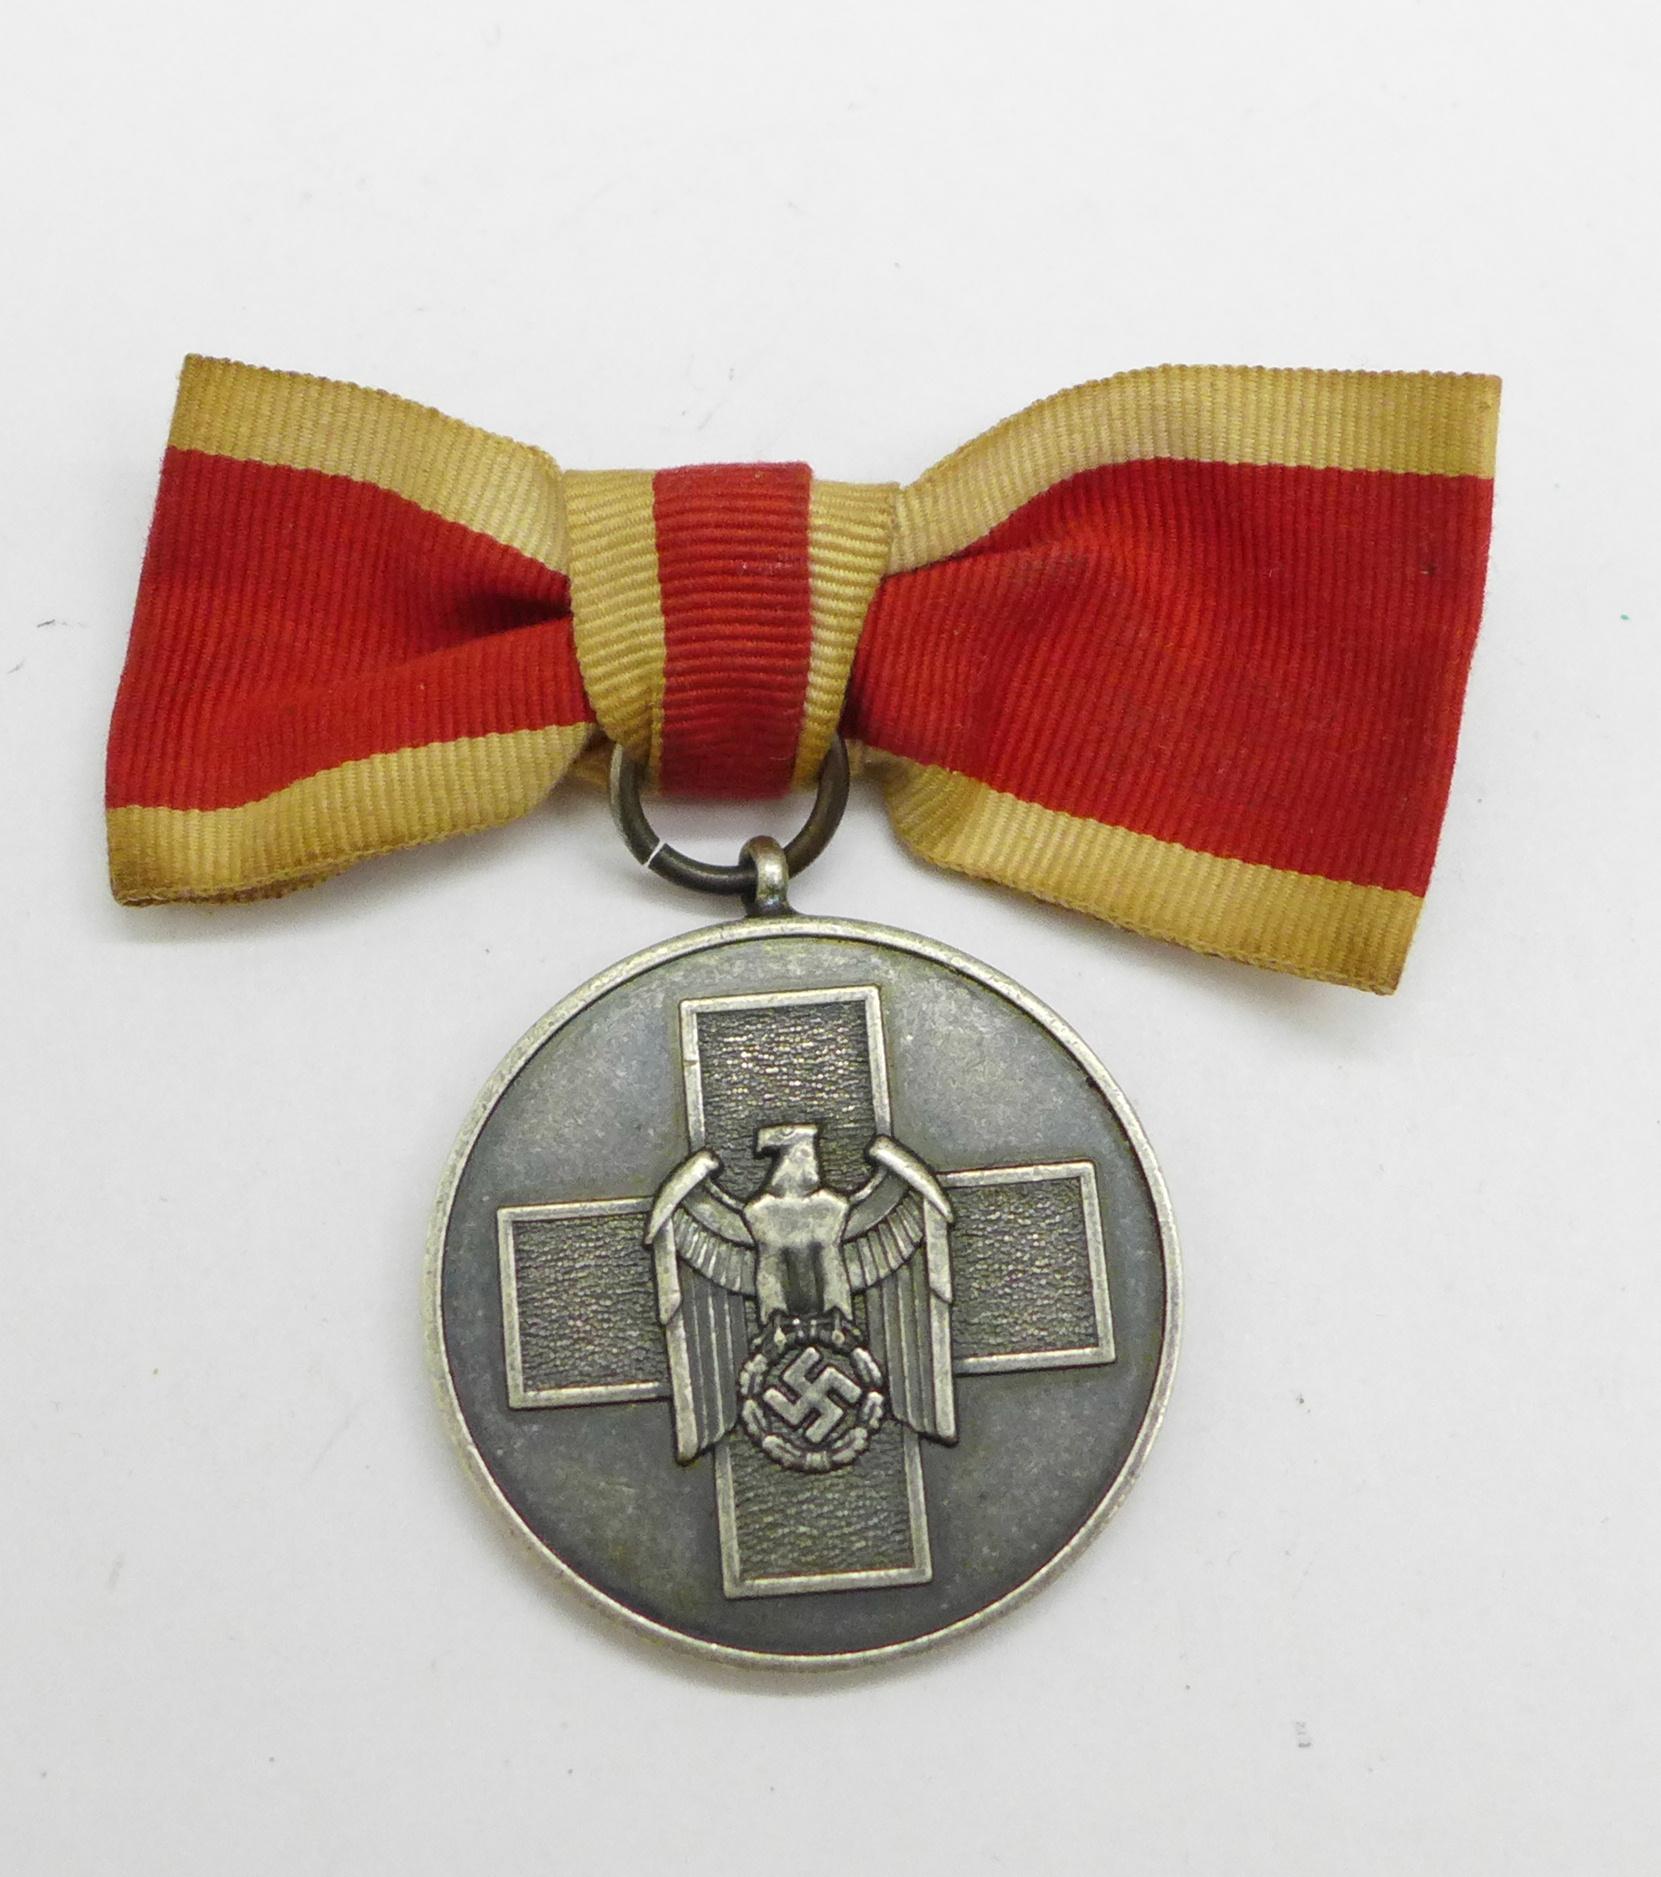 A WWII German Social Welfare for women medal